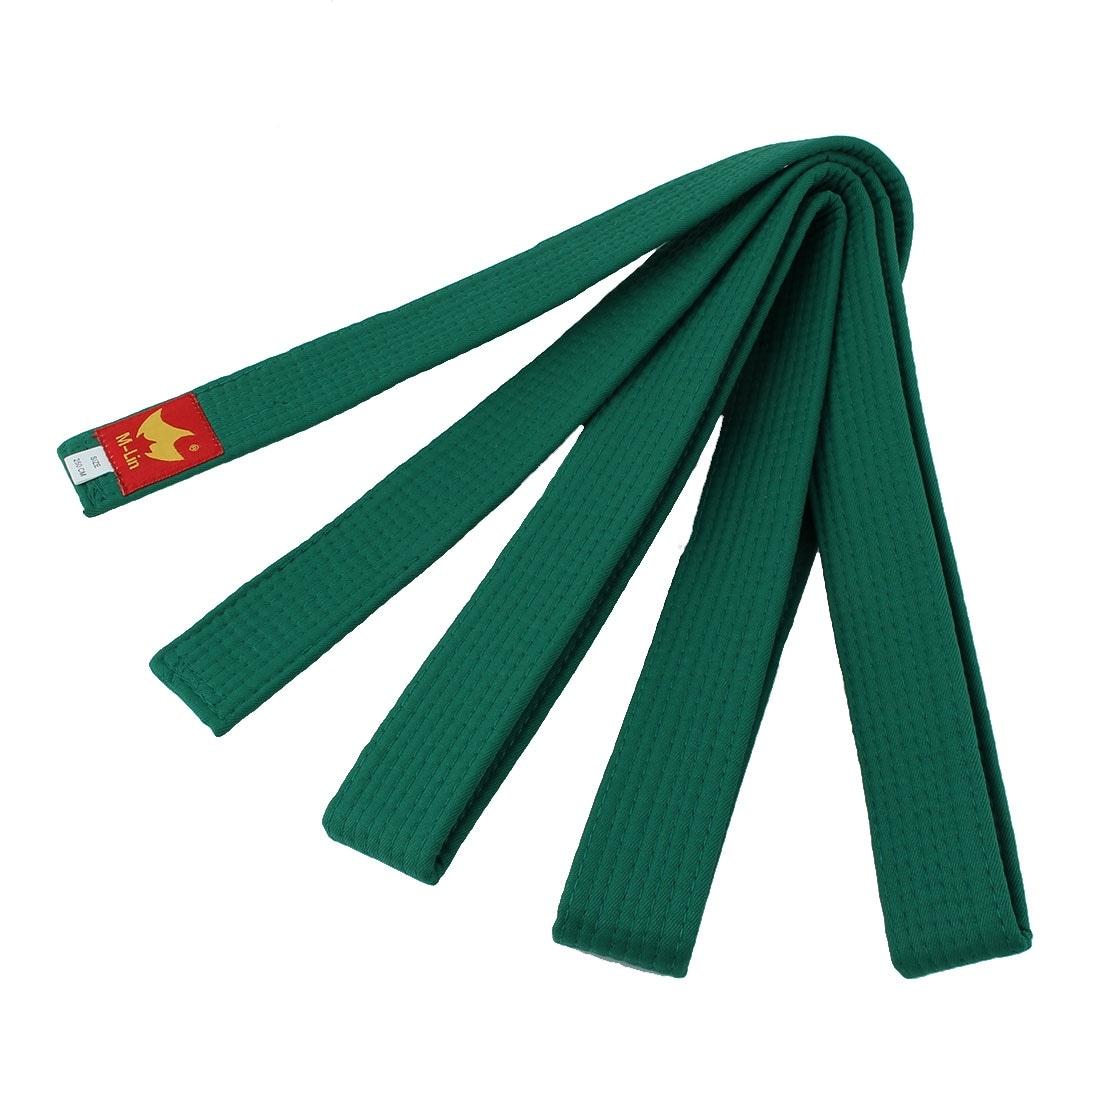 Martial Arts Rank Belts Karate Tae Kwon Do Child Adult Double Wrap Black Stripe